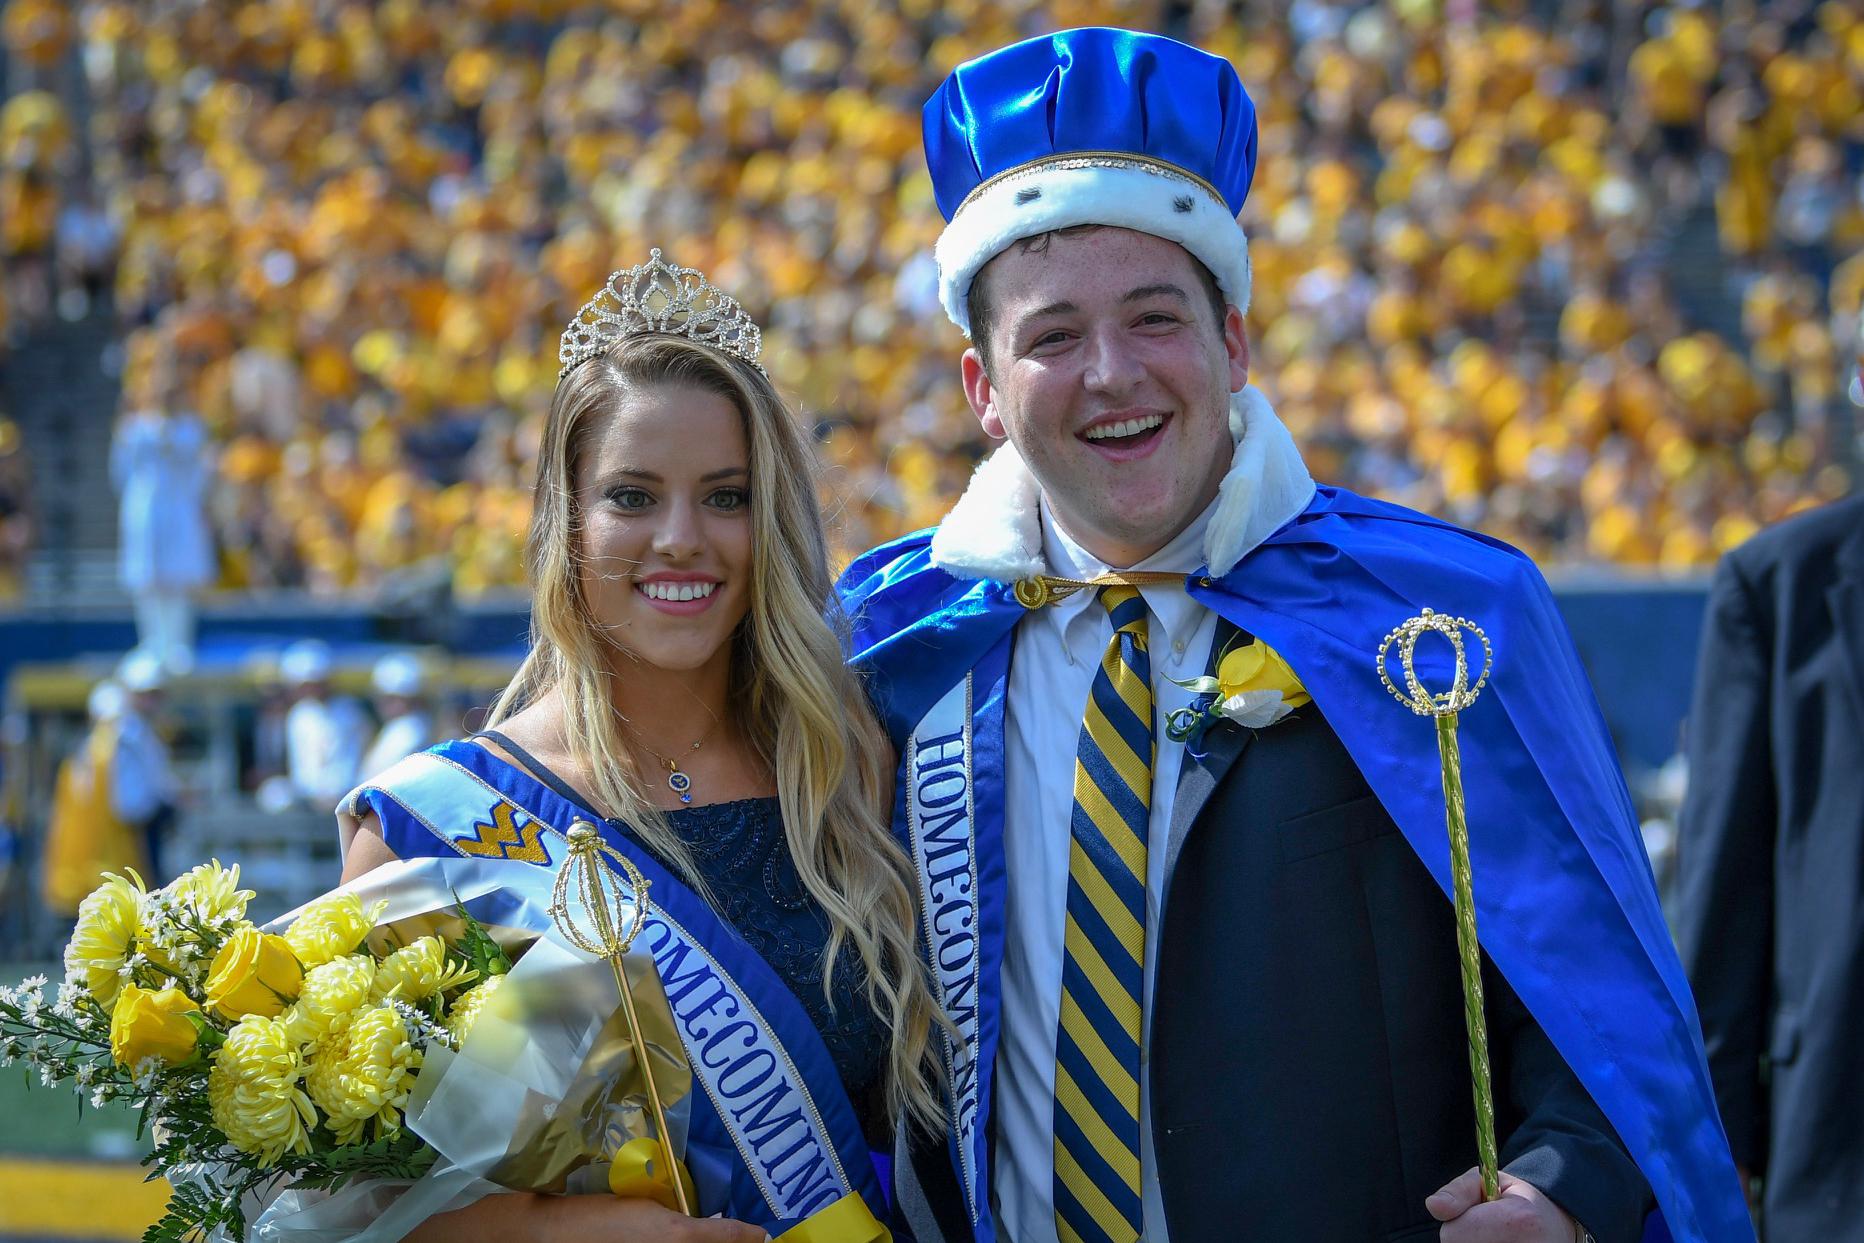 ernest jr and lobban named 2018 wvu homecoming king queen wvu